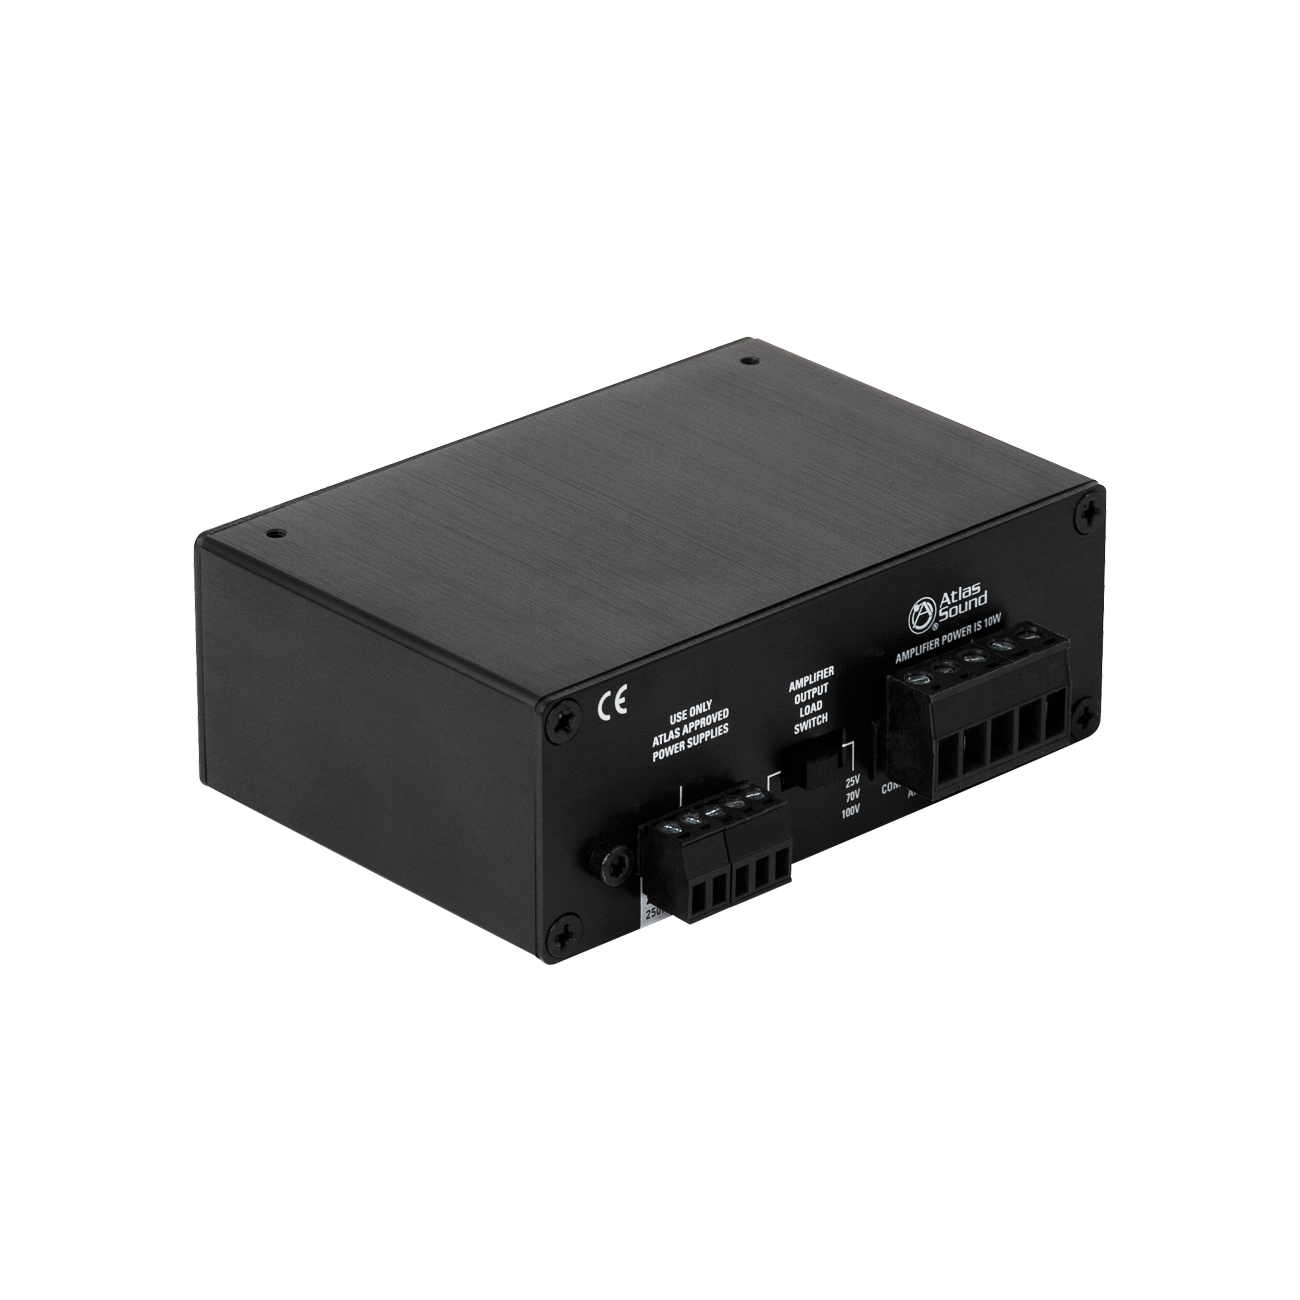 1 Input 10 Watt 25v 70v 100v 4 Power Amplifier Atlasied